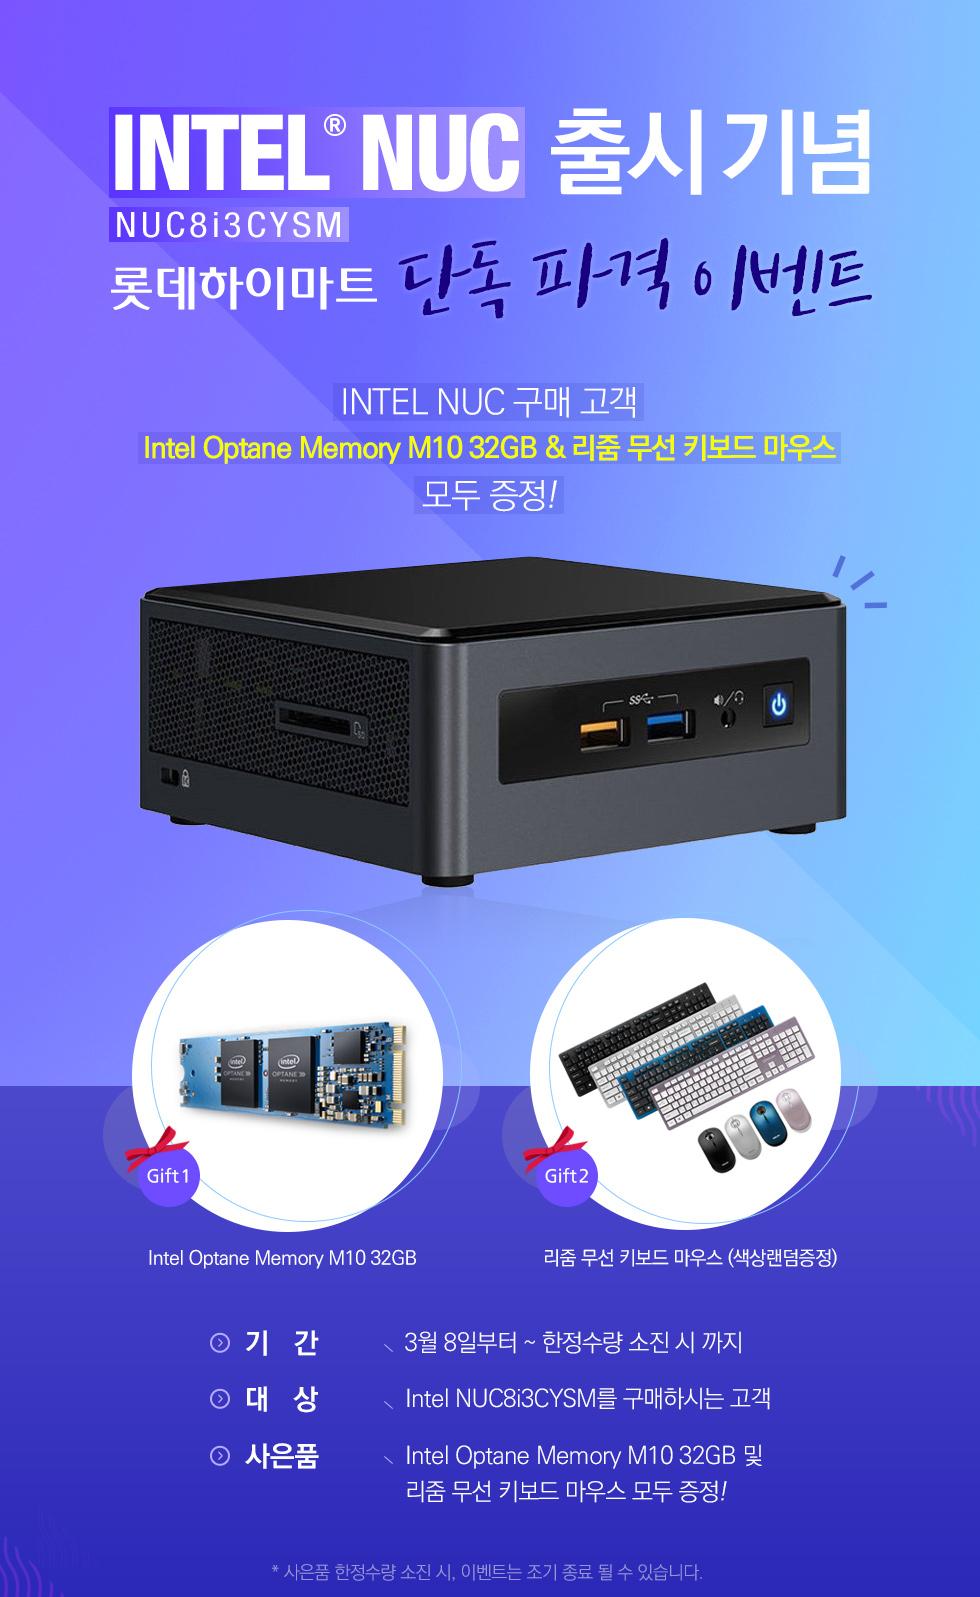 IntelNUC_0307.jpg